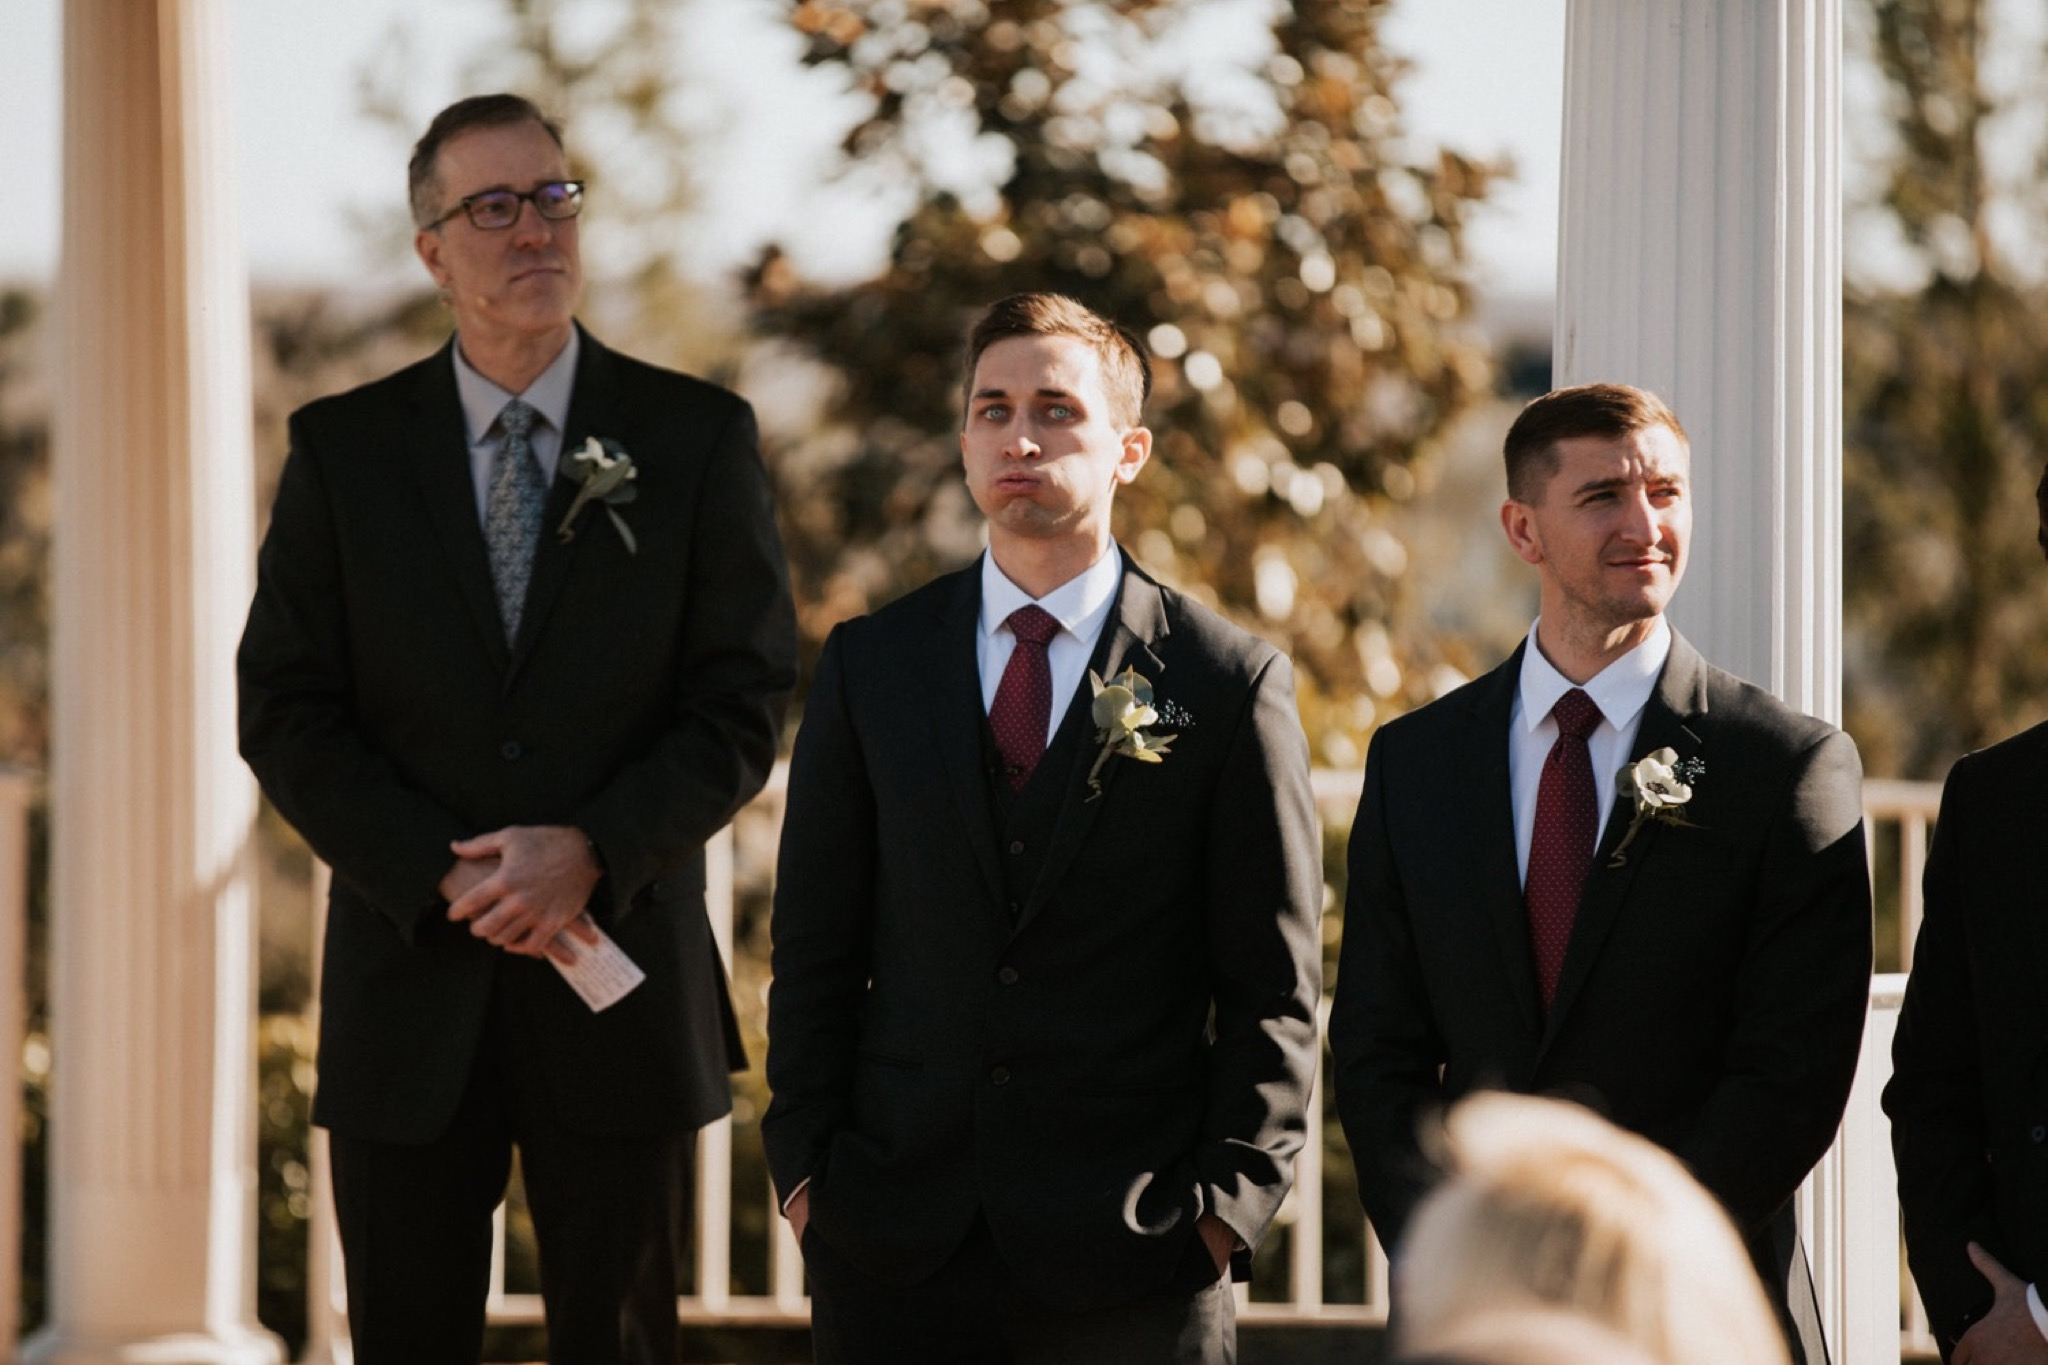 39_West Manor Estate Weddings - Pat Cori Photography-86_Ceremony_VirginiaWeddingPhotographer_PatCoriPhotography_WestManorEstate_Wedding.jpg